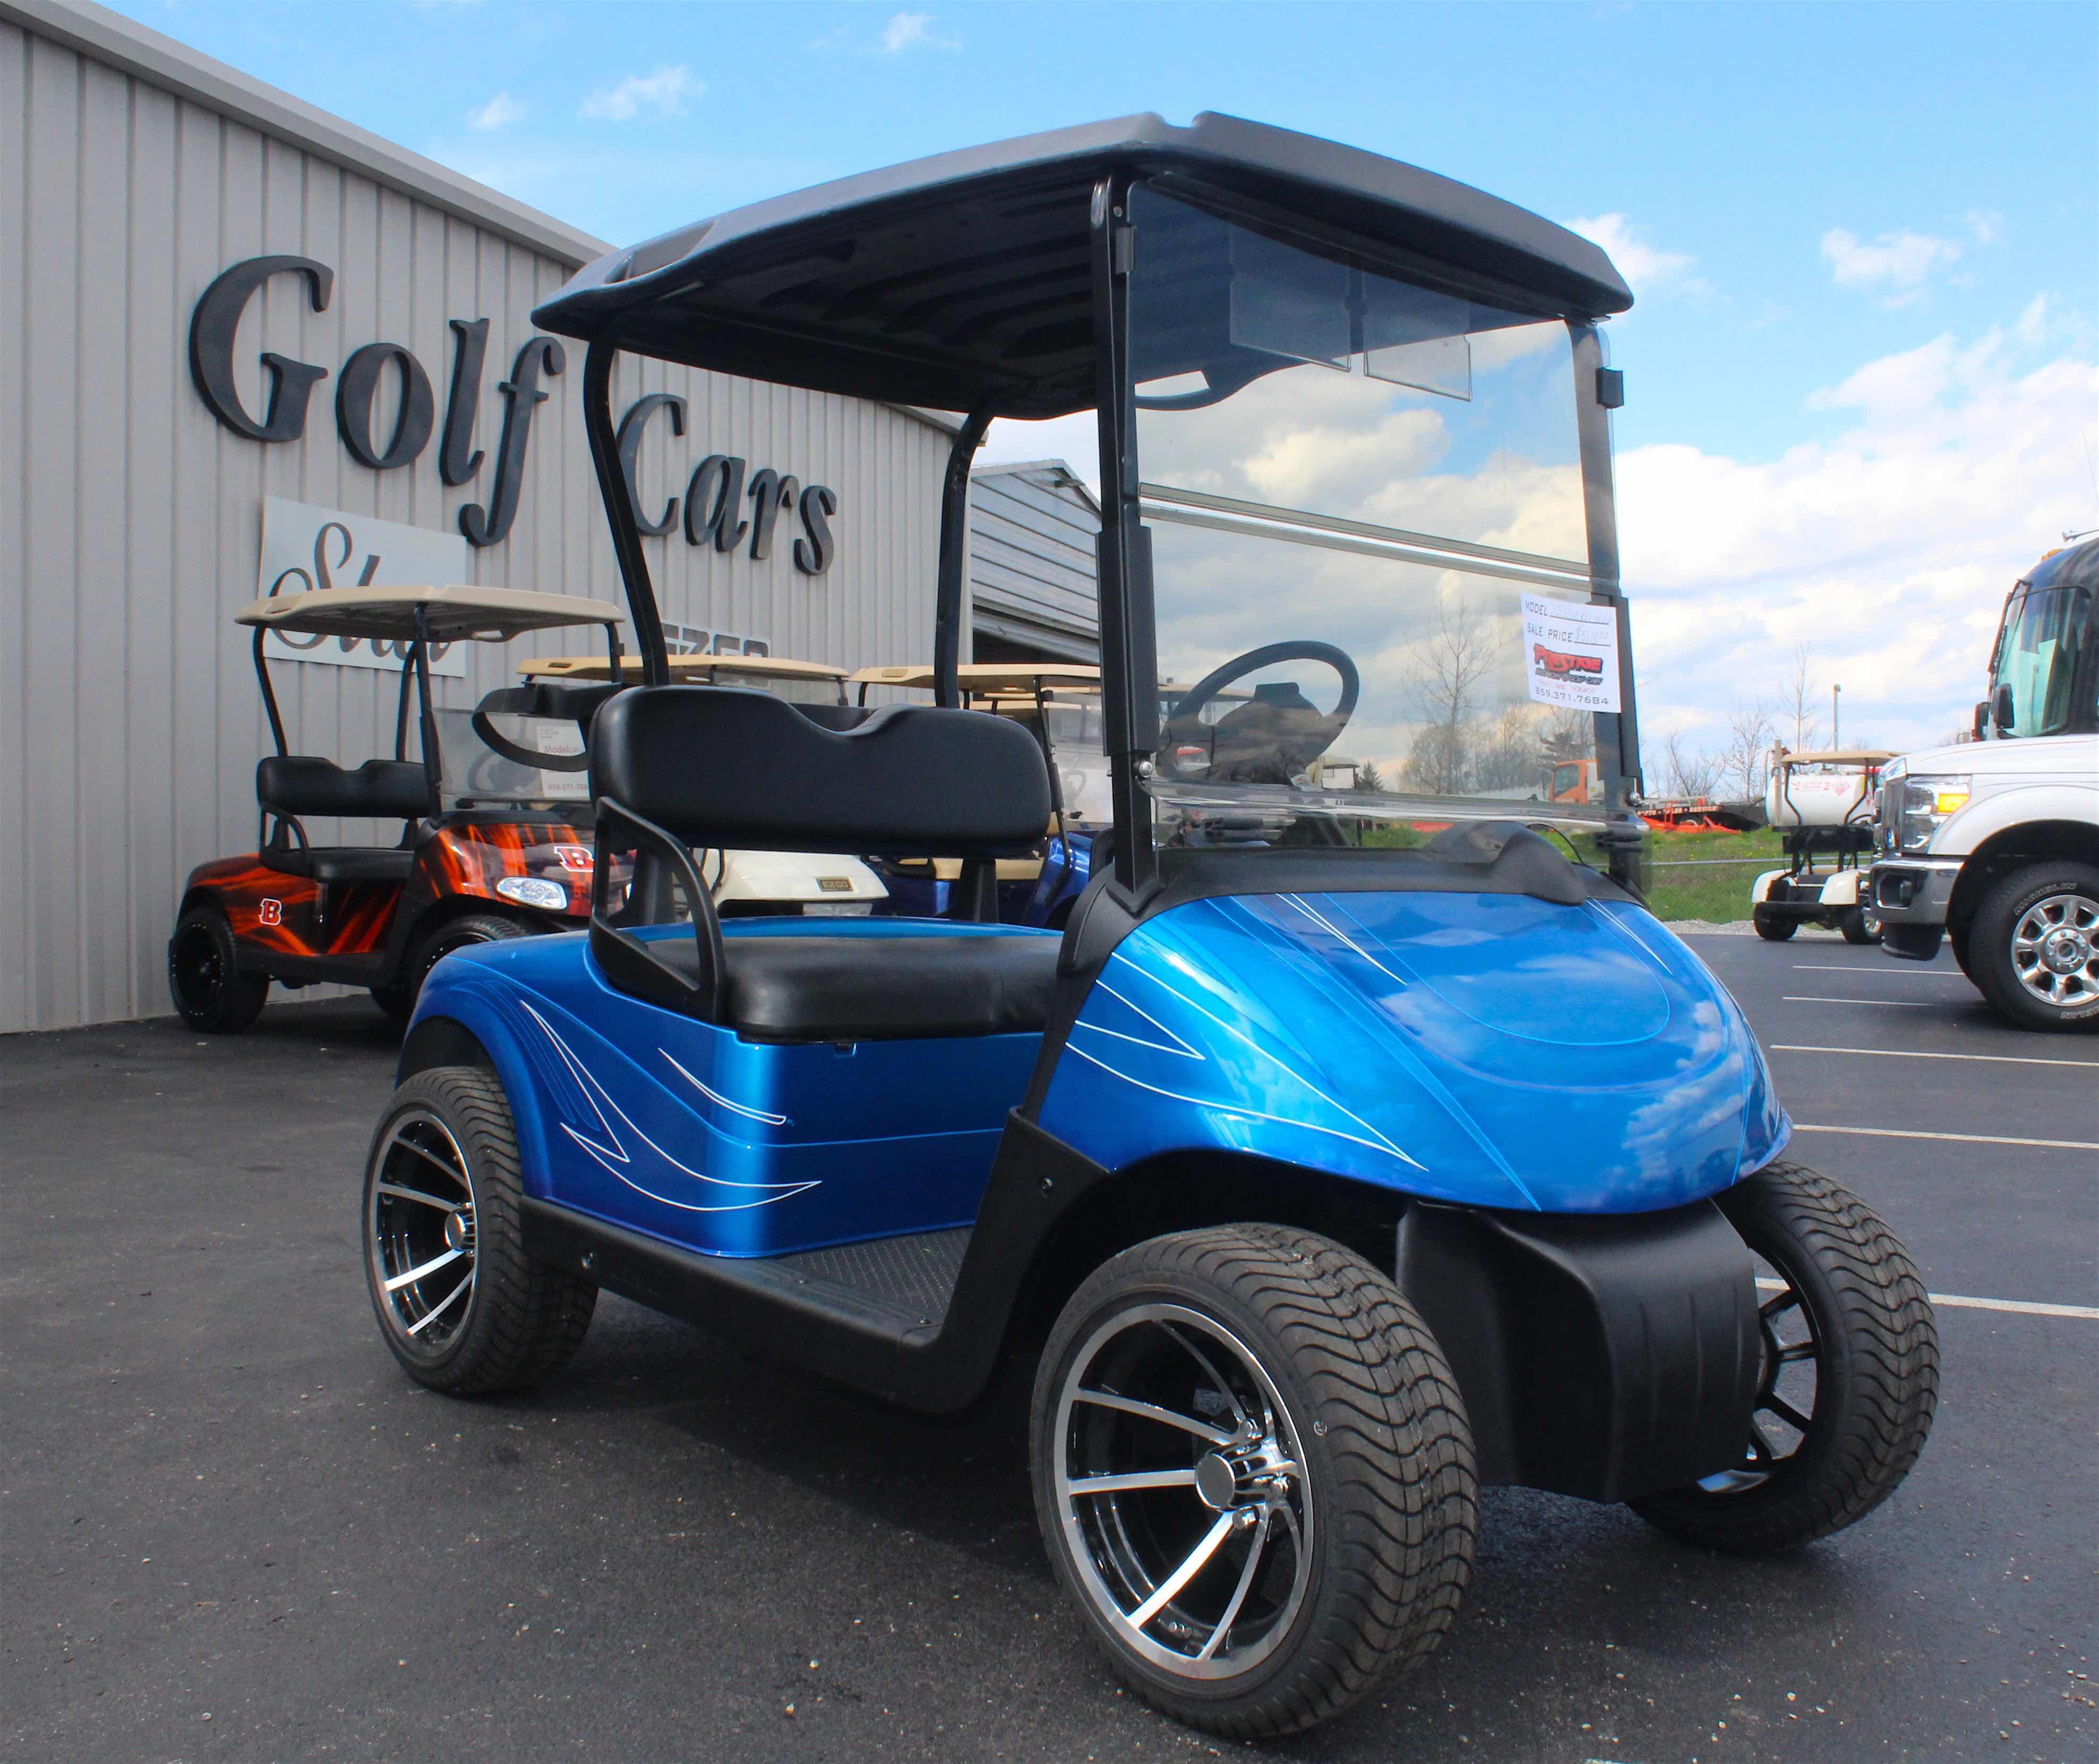 prestige auto boat golf car florence kentucky ky. Black Bedroom Furniture Sets. Home Design Ideas